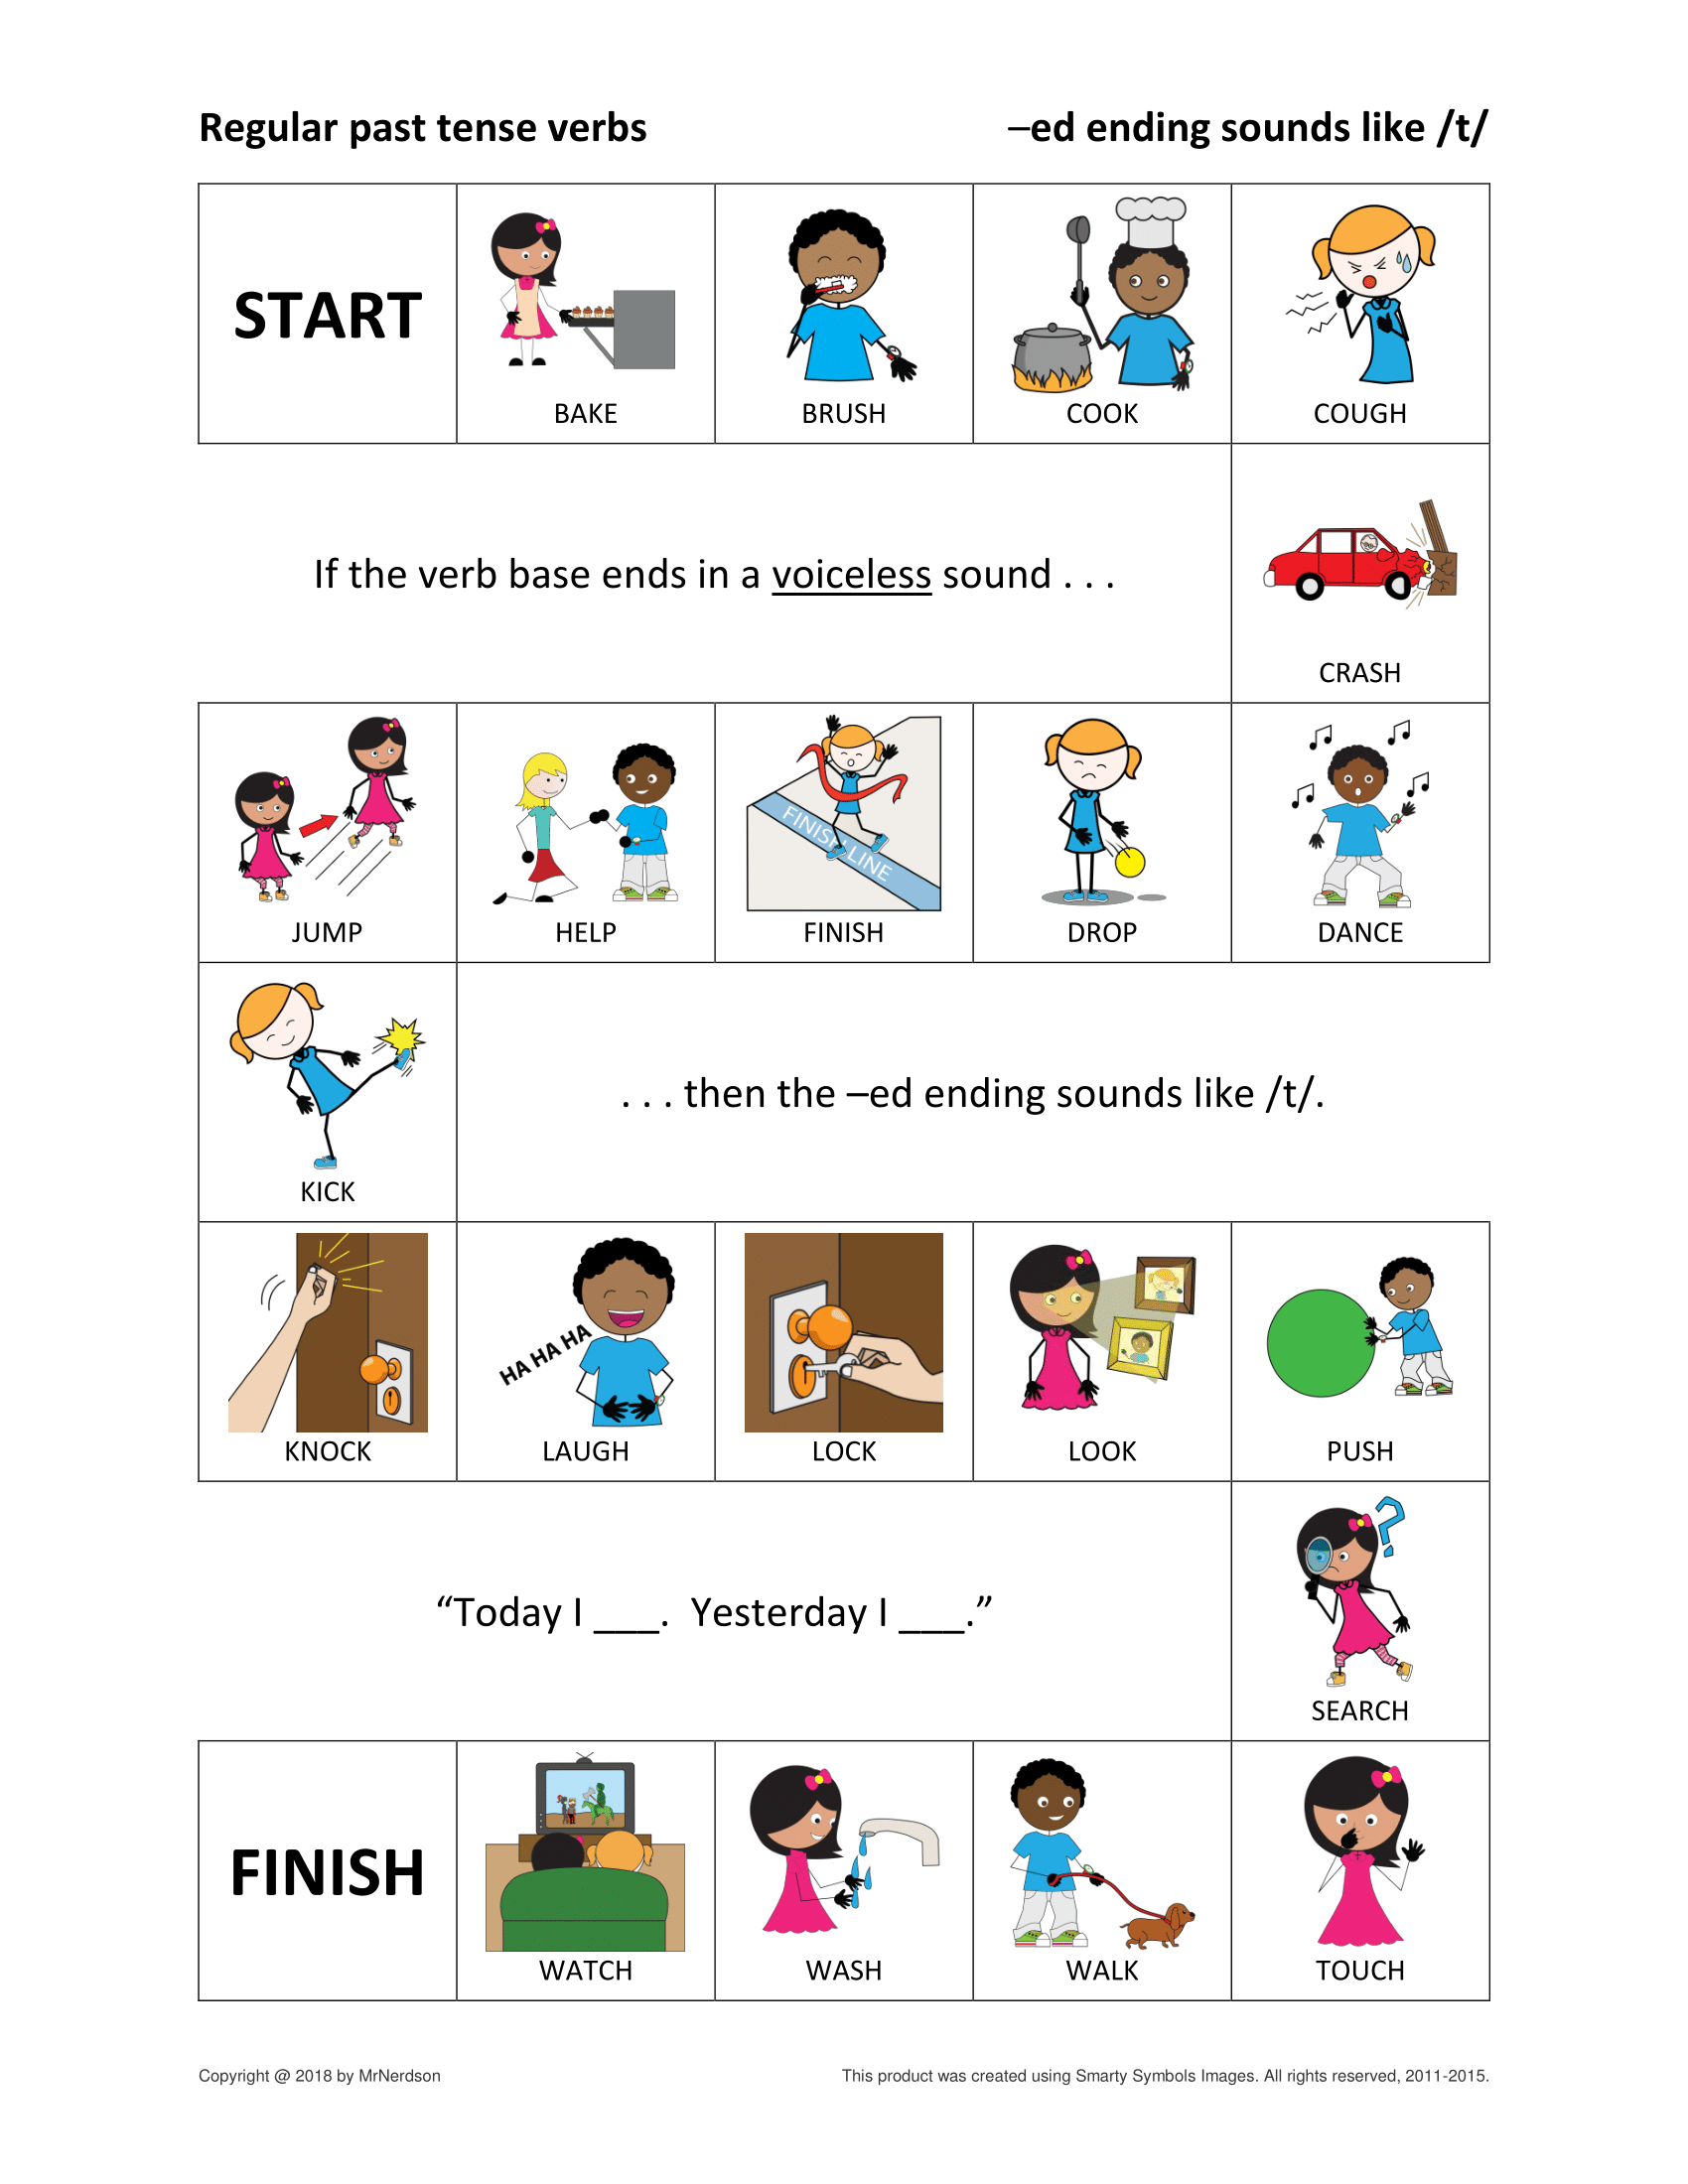 Regular Past Tense Verbs Games For Ending Sounds T D ɪd Regular Past Tense Verbs English Conversation For Kids Verbs Activities [ 2200 x 1700 Pixel ]